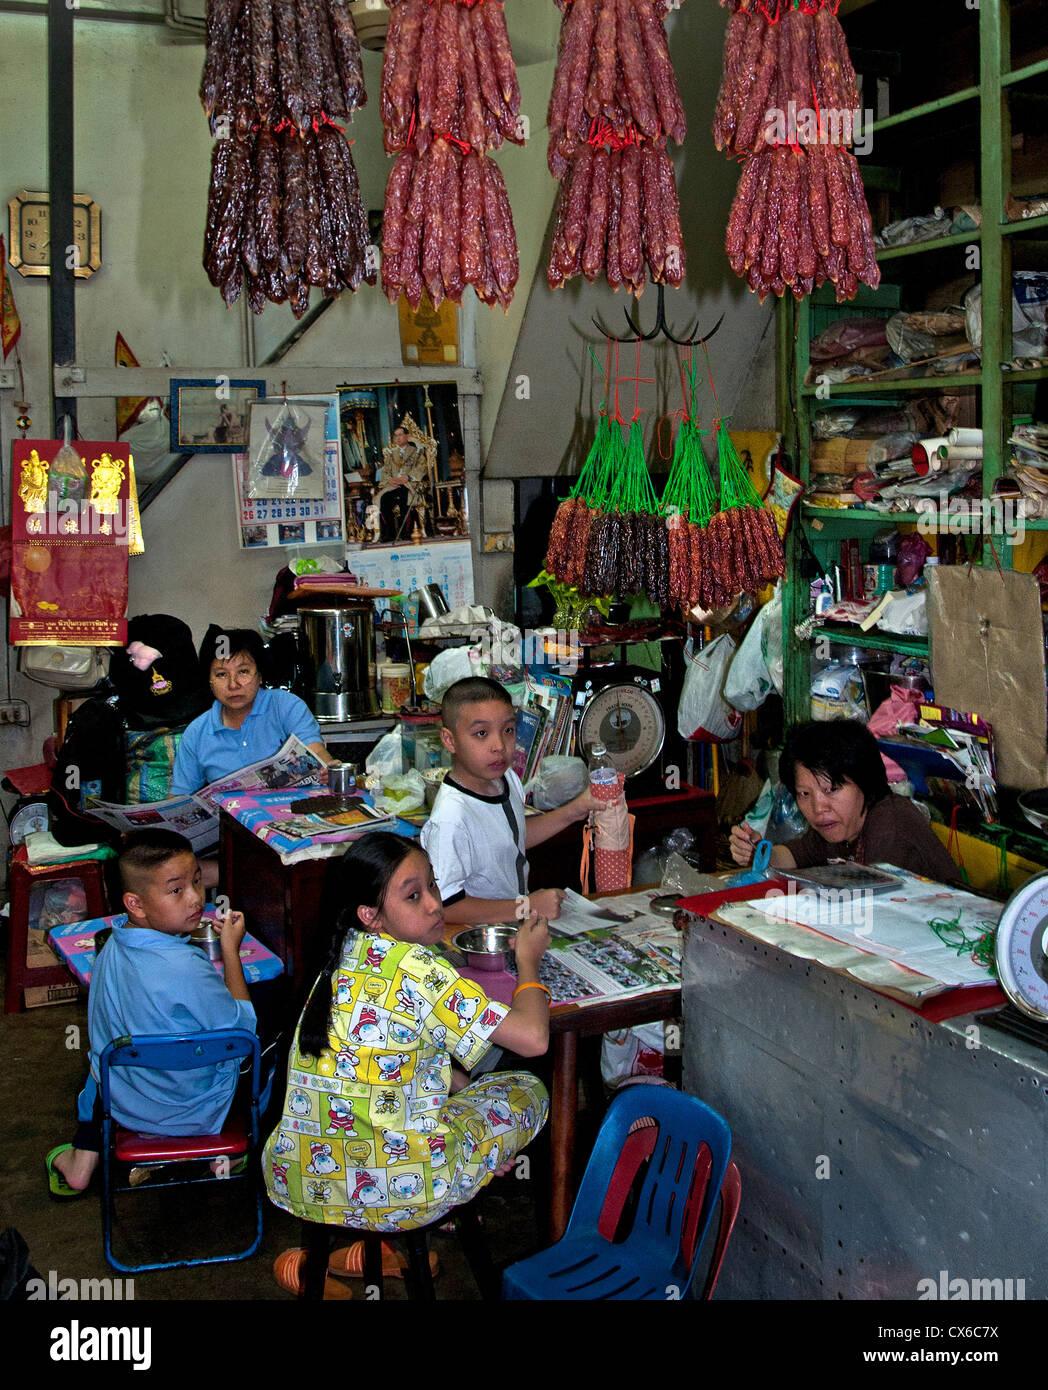 Thai Food And Craft Festival